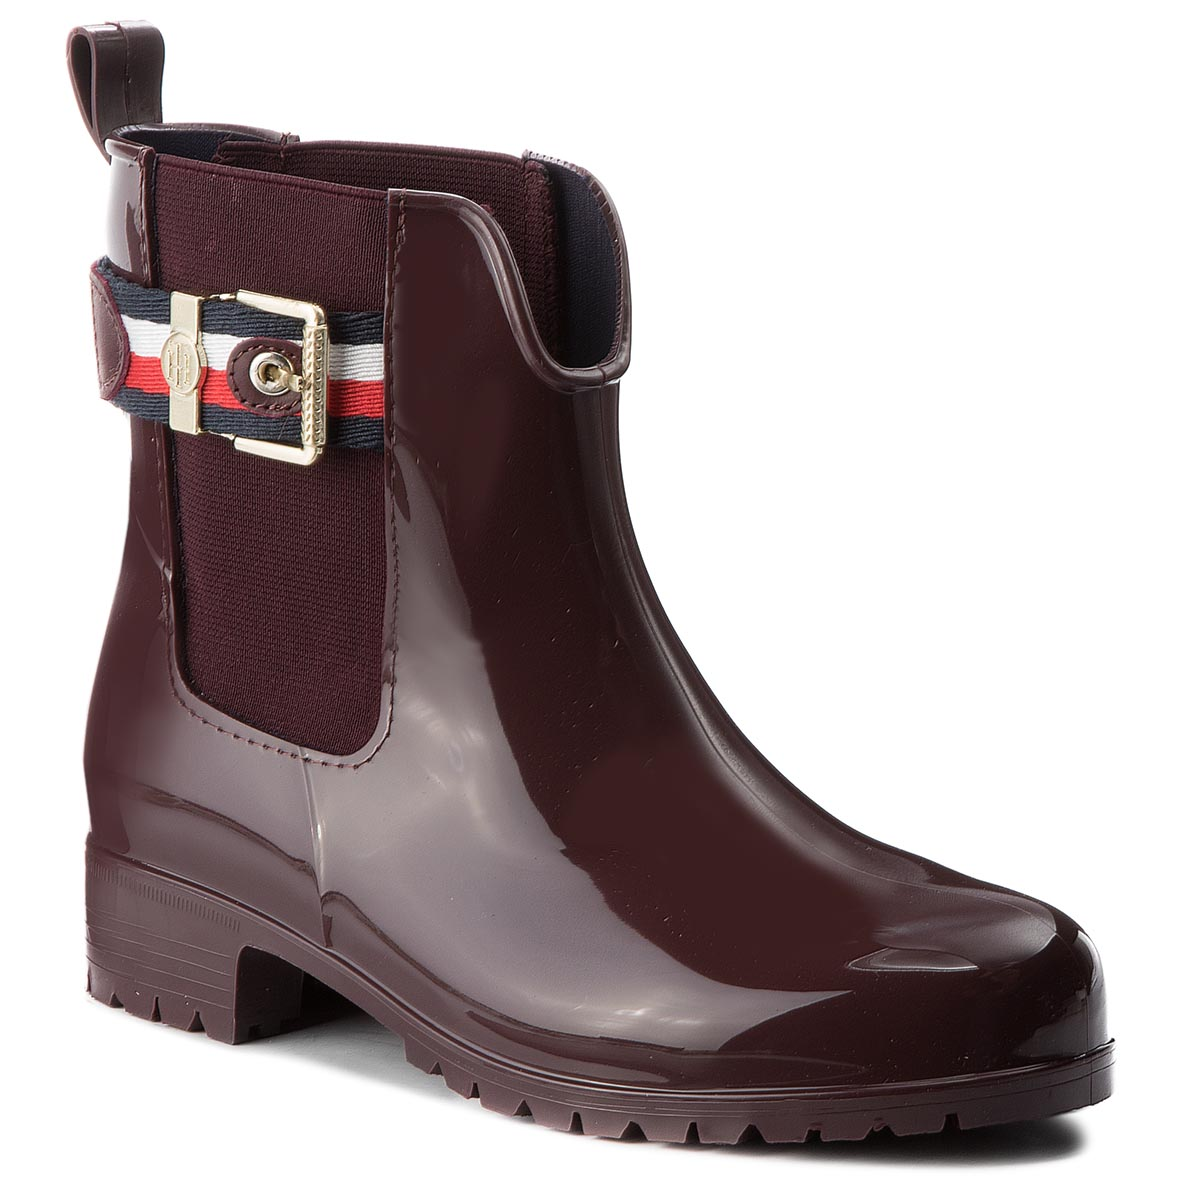 Gumicsizmák TOMMY HILFIGER - Corporate Belt Rain FW0FW03329 Decadent  Chocolate 296 7447b4fab6